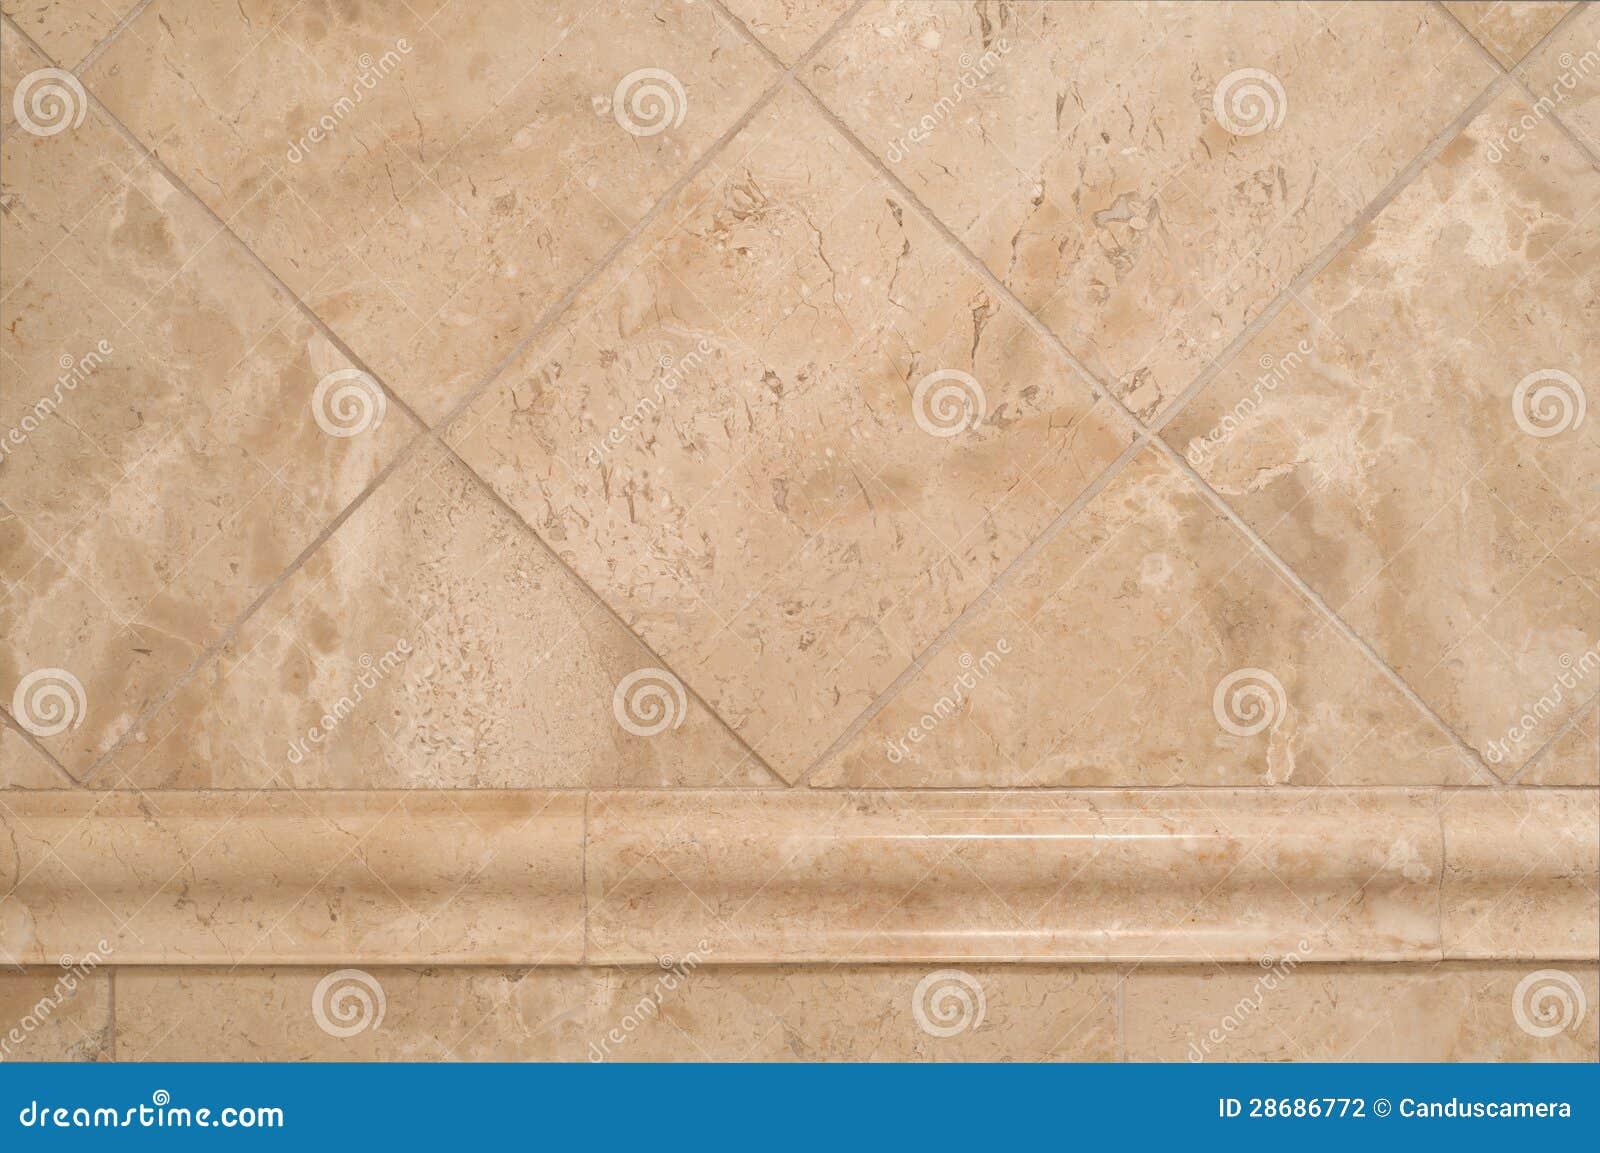 Beige Stone Tiles On Bathroom Wall Stock Photo Image Of Interior - Beige-stone-bathroom-tiles